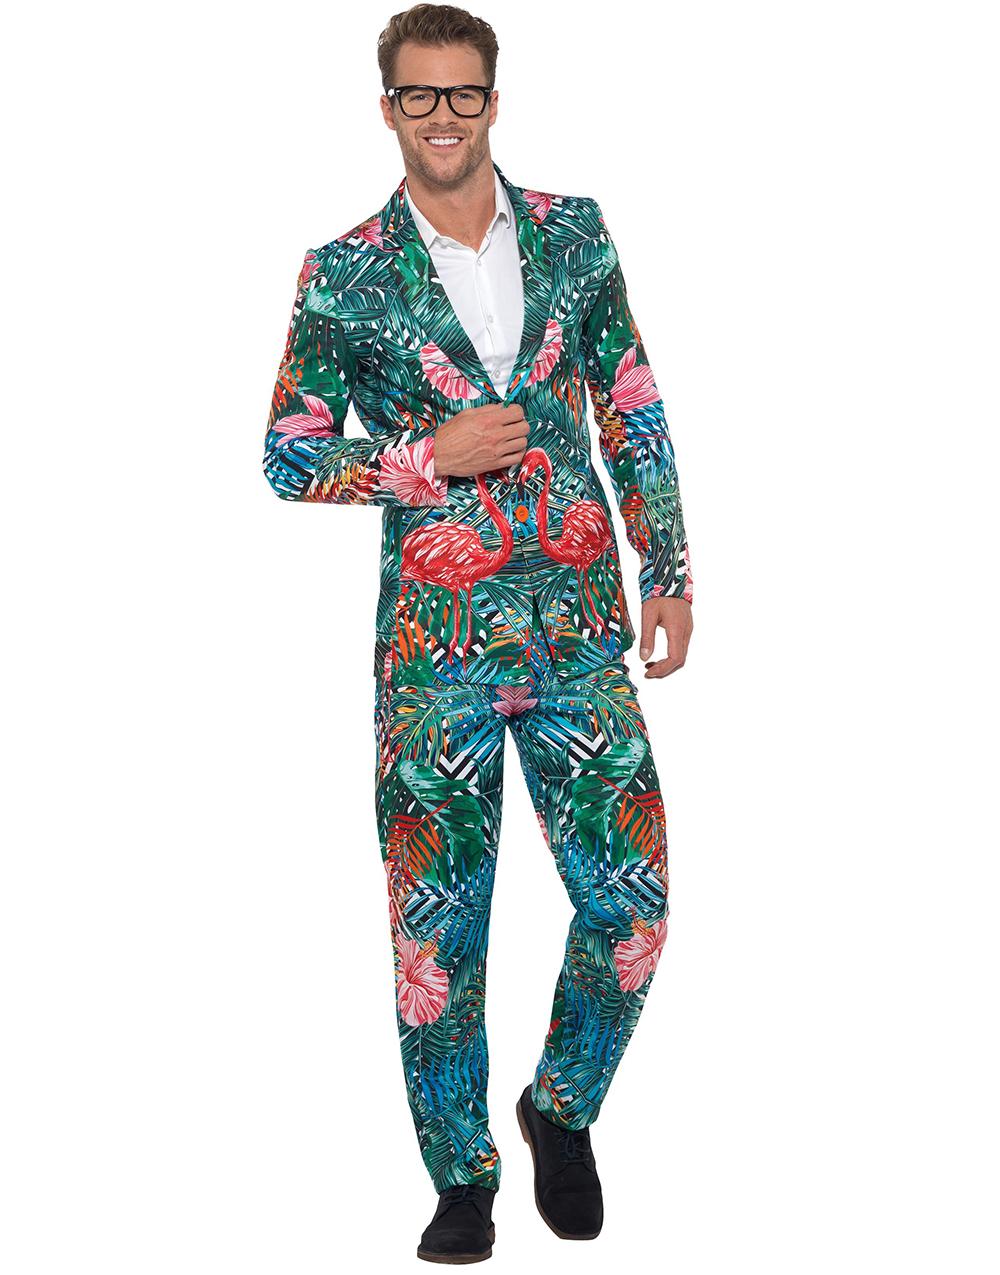 Aloha Hawaii Stand Out Suit